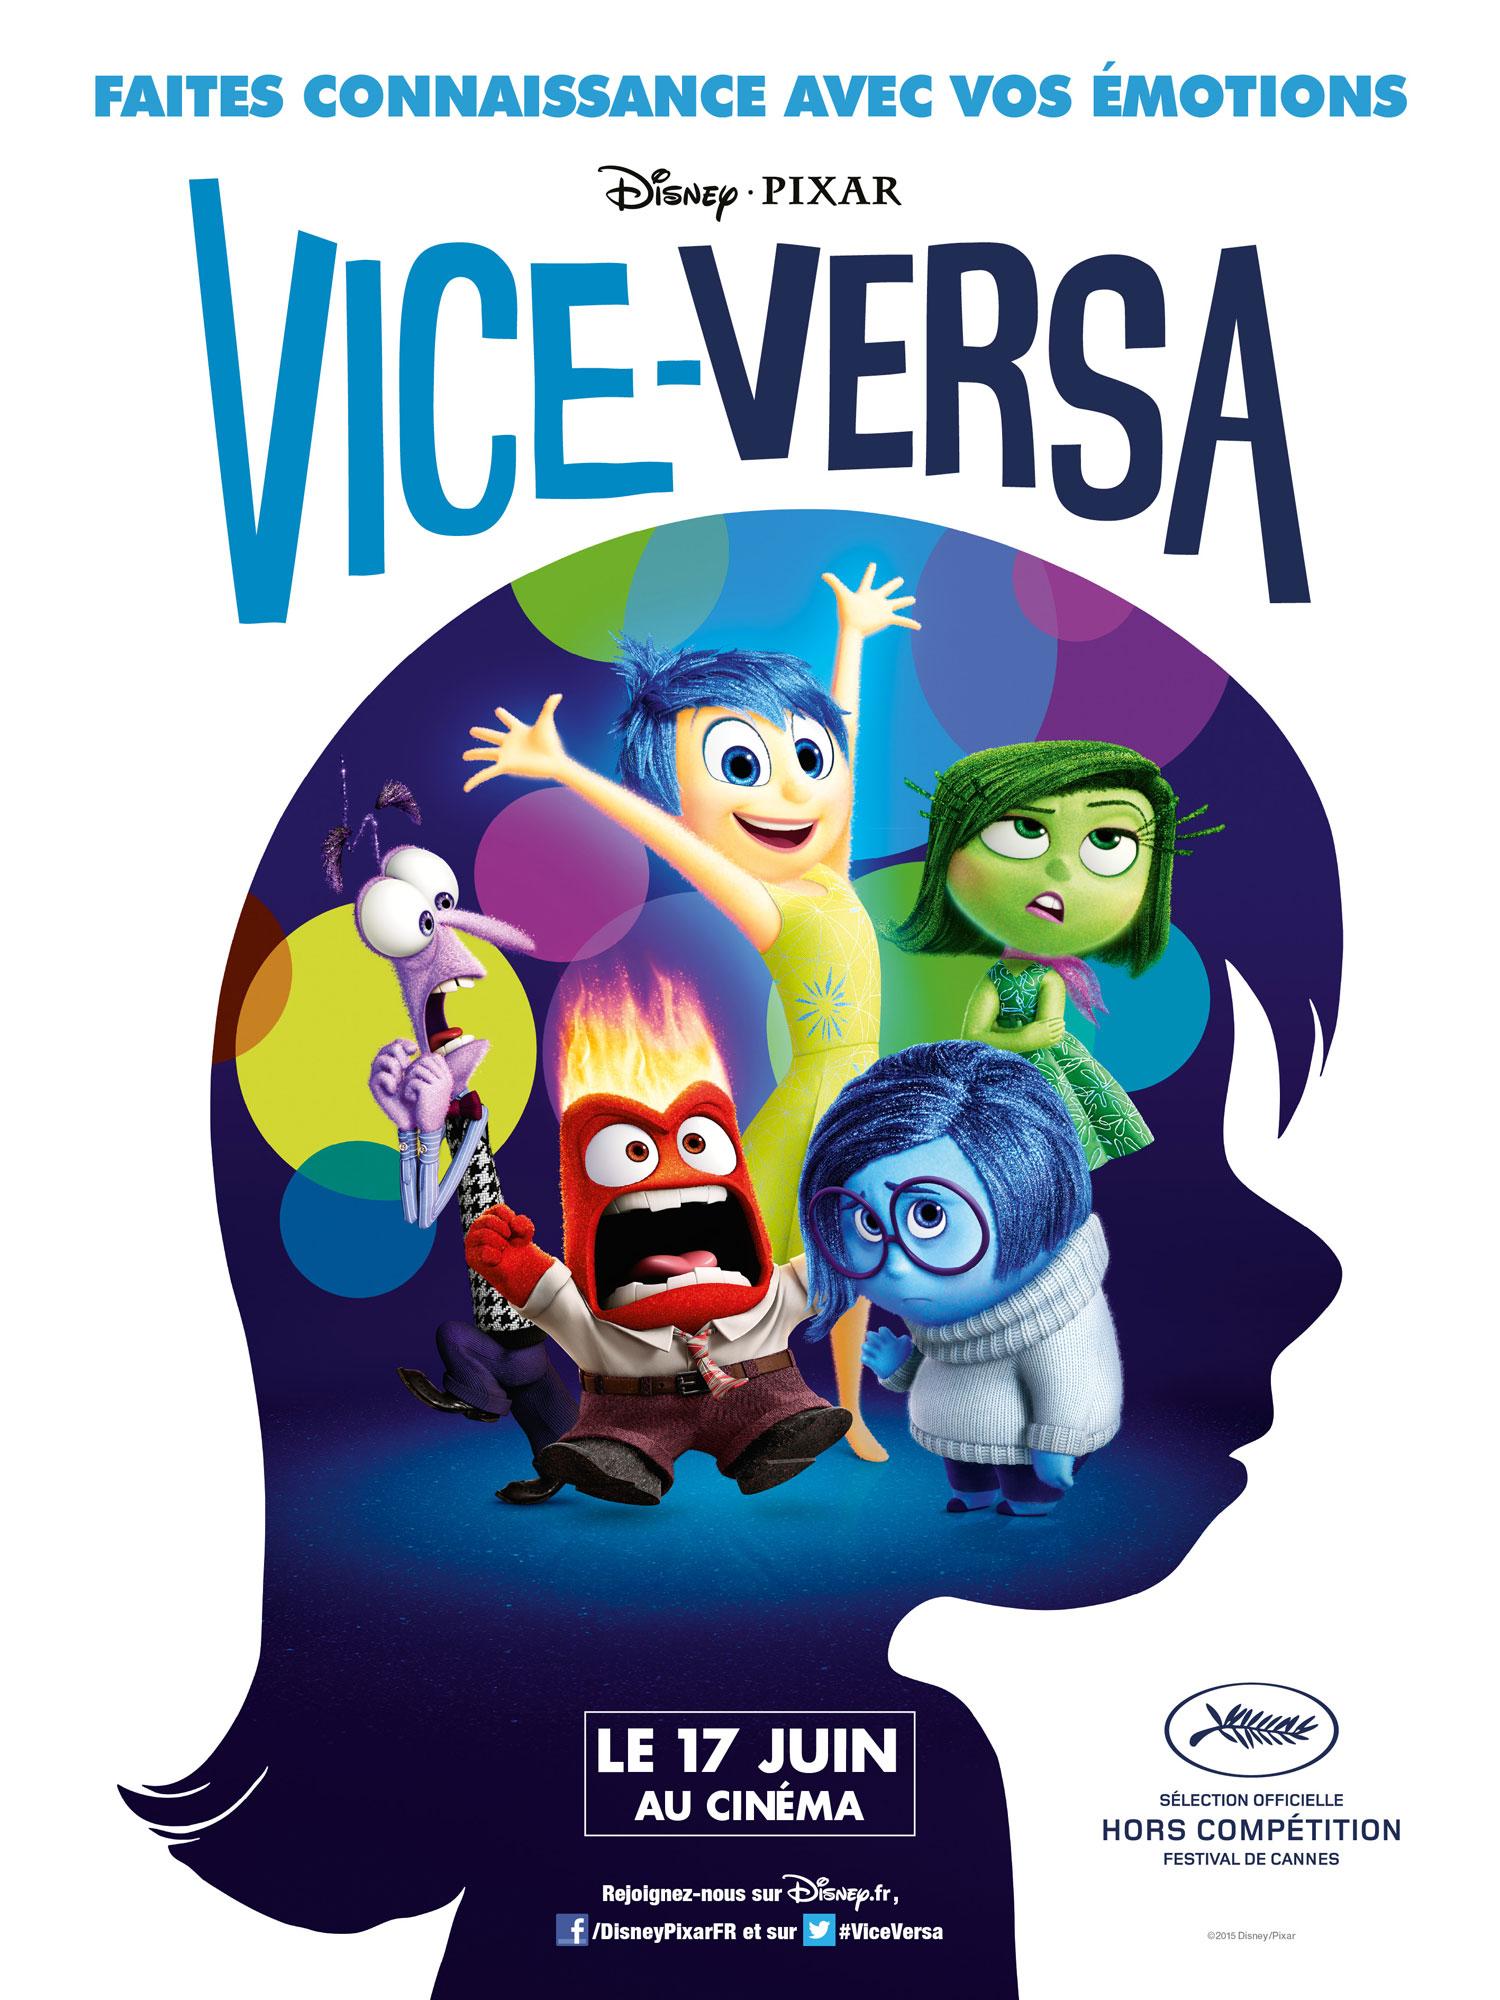 pixar disney affiche poster vice versa inside outpixar disney affiche poster vice versa inside out